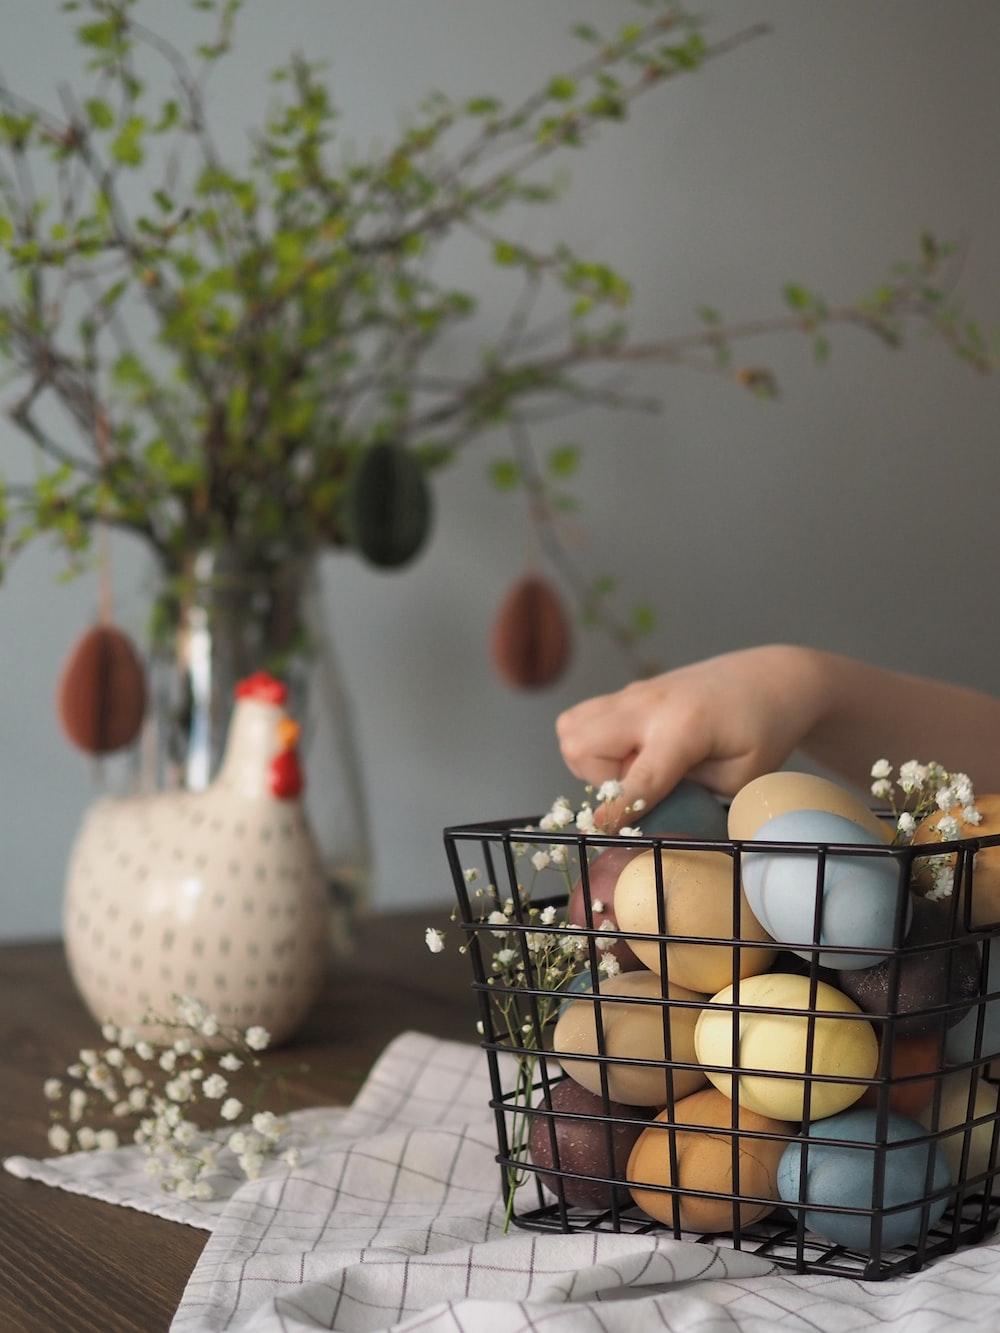 white egg in black metal basket on white table cloth